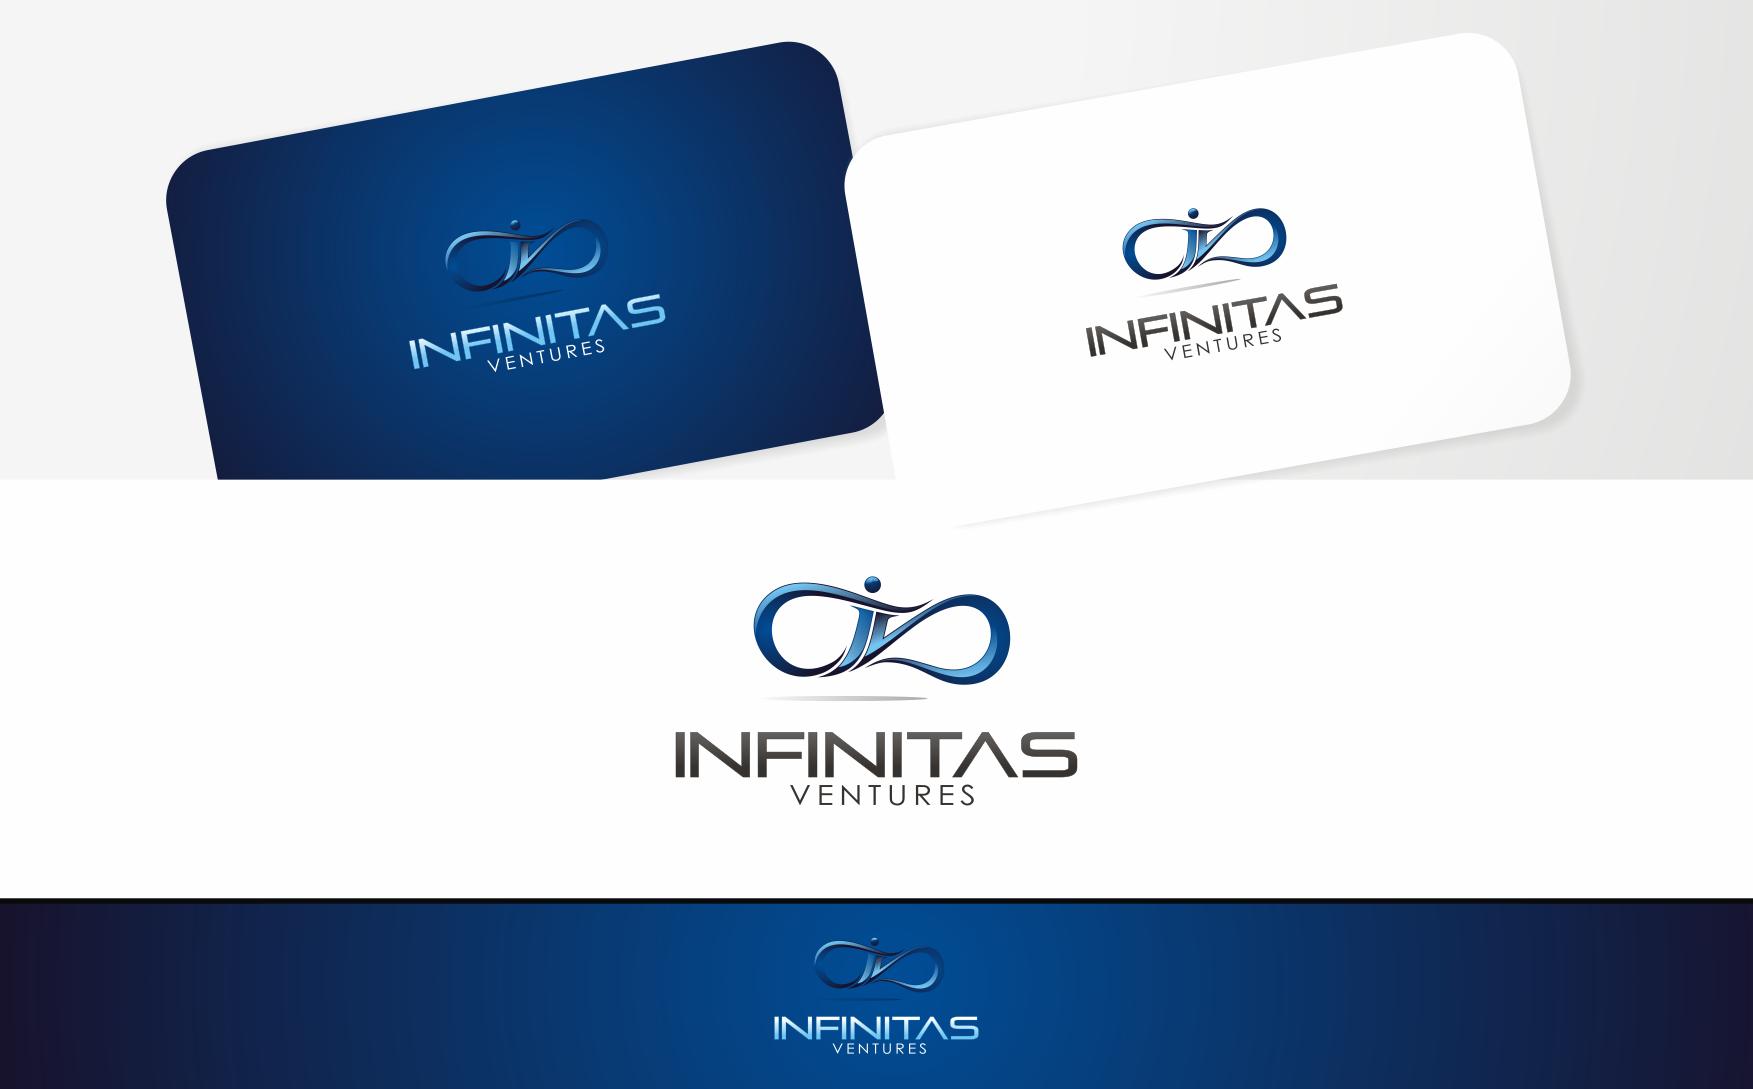 Design debut logo for Infinitas Ventures